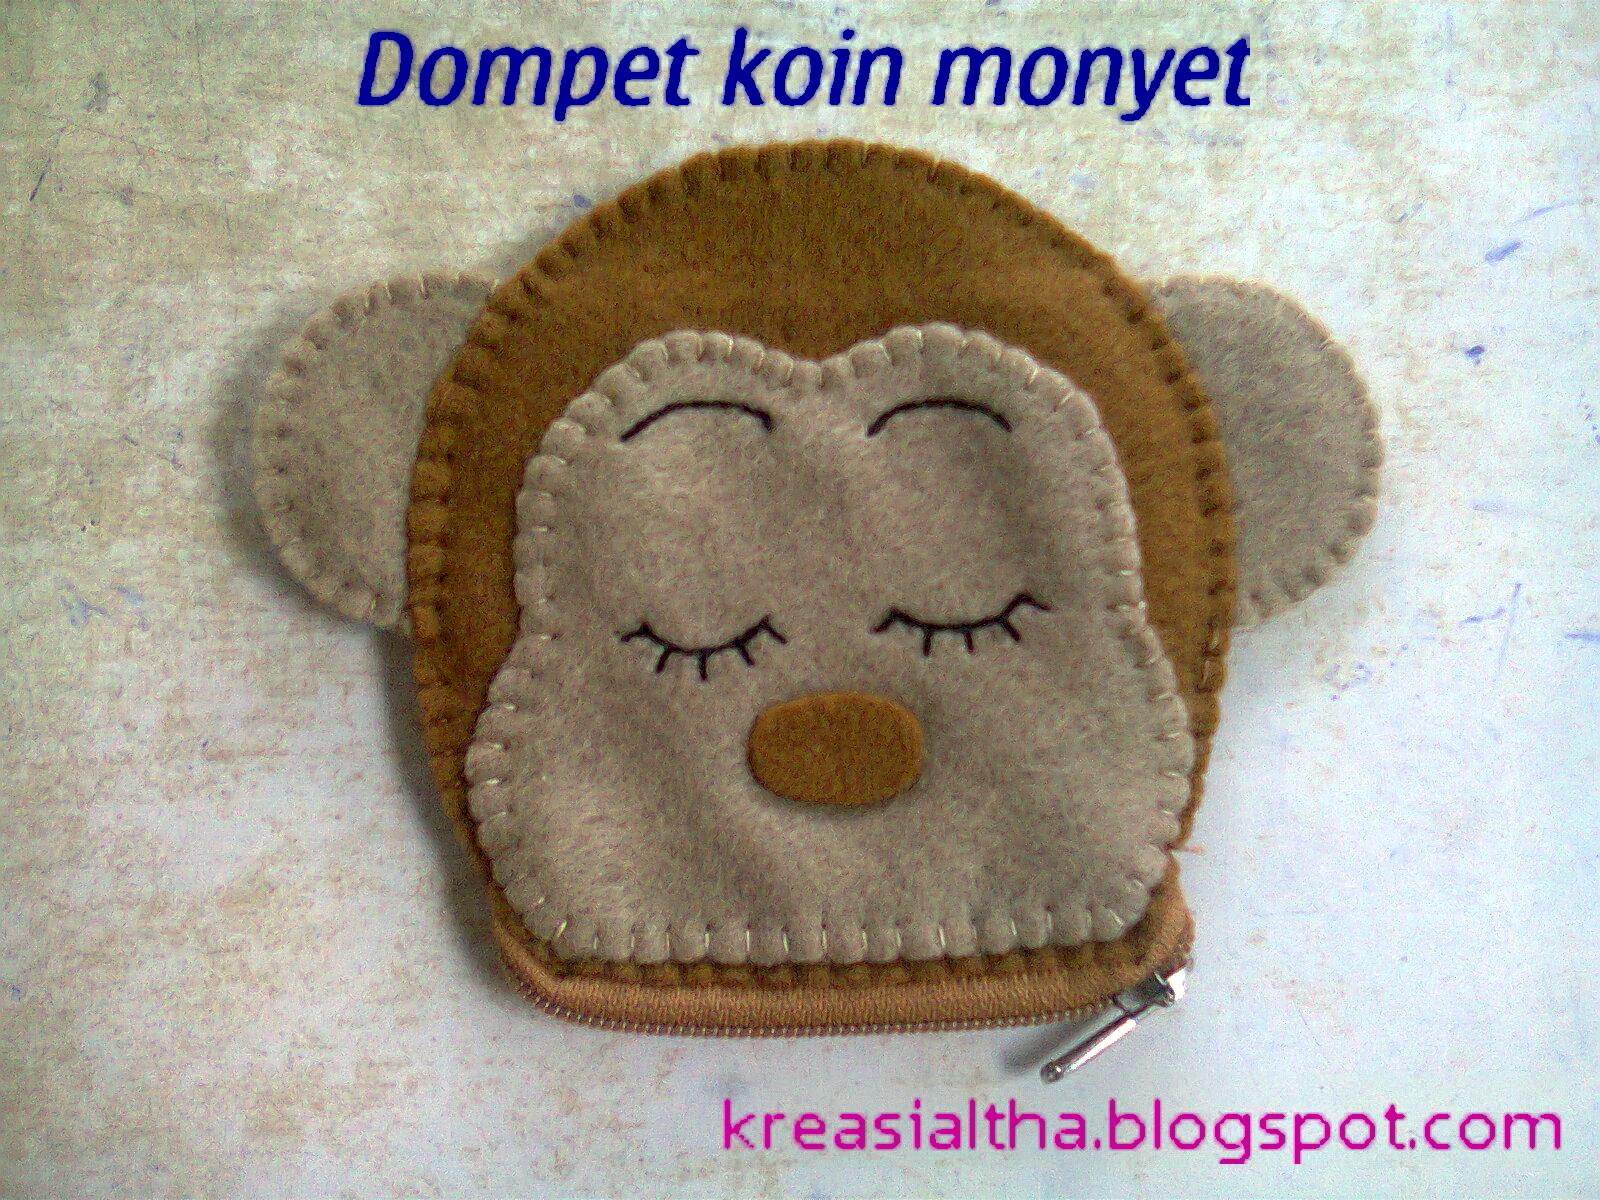 dompet koin kepala monyet